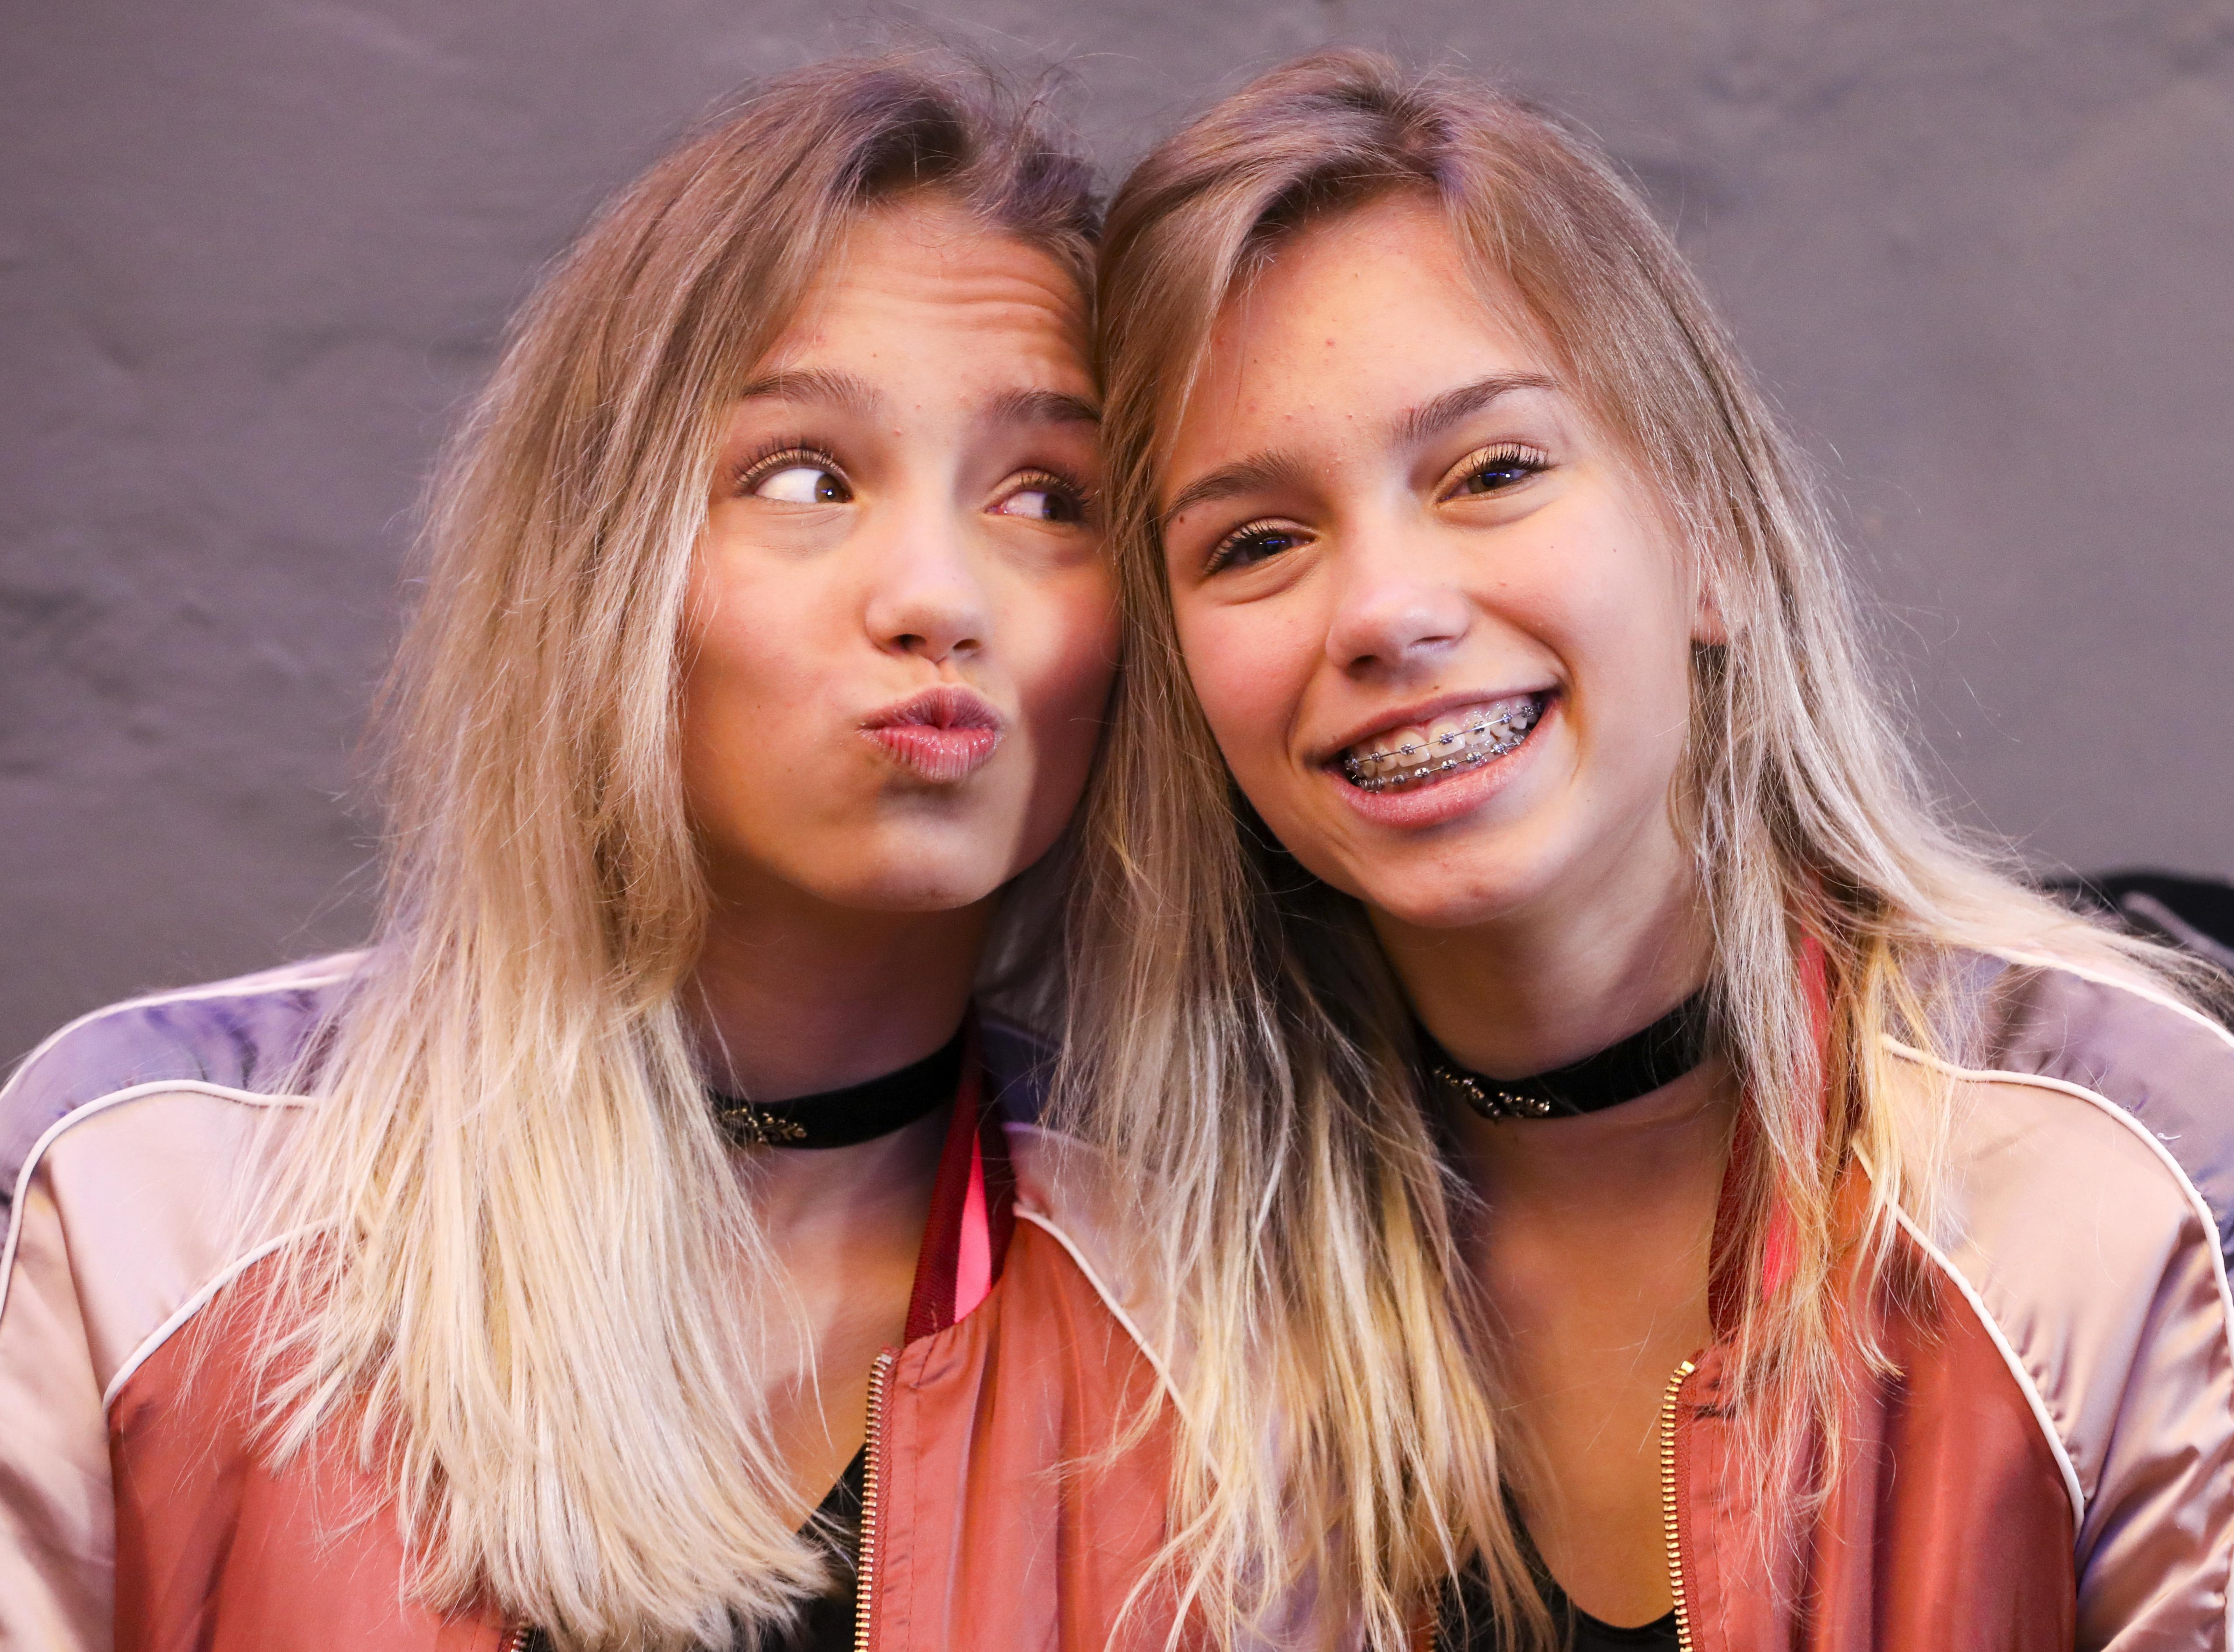 Die Musical.ly und Social-Media-Stars Lisa und Lena